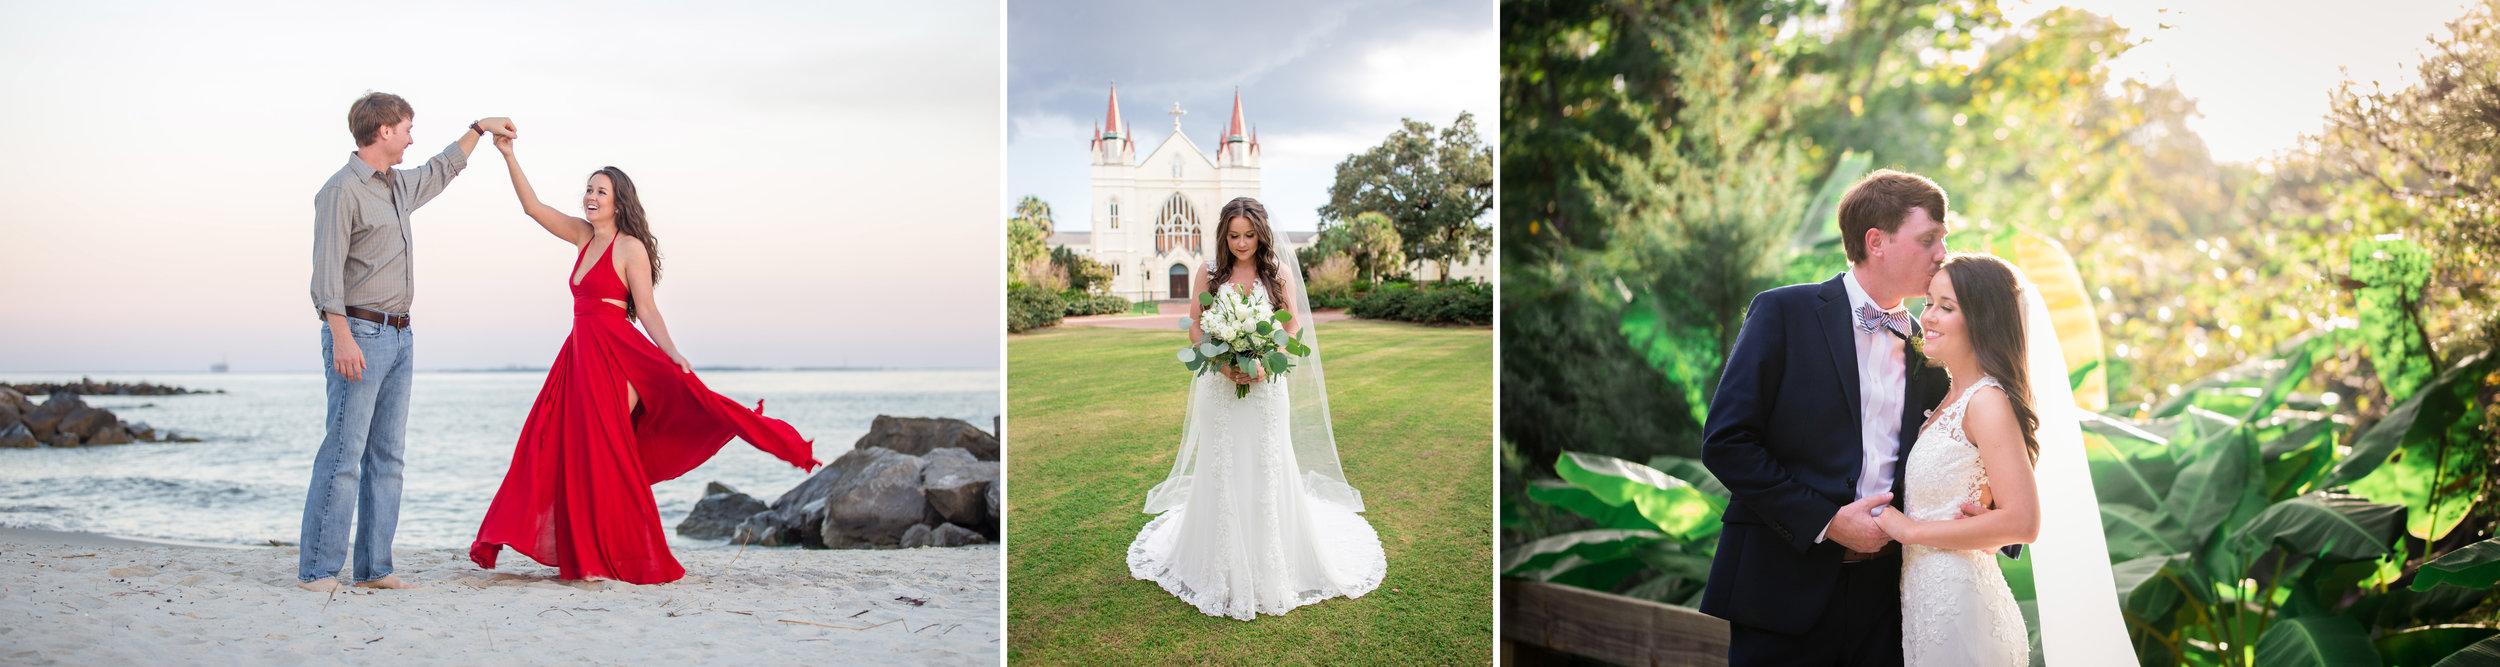 wedding engagement bridal photo photography pensacola fairhope bella sera gardens dauphin island